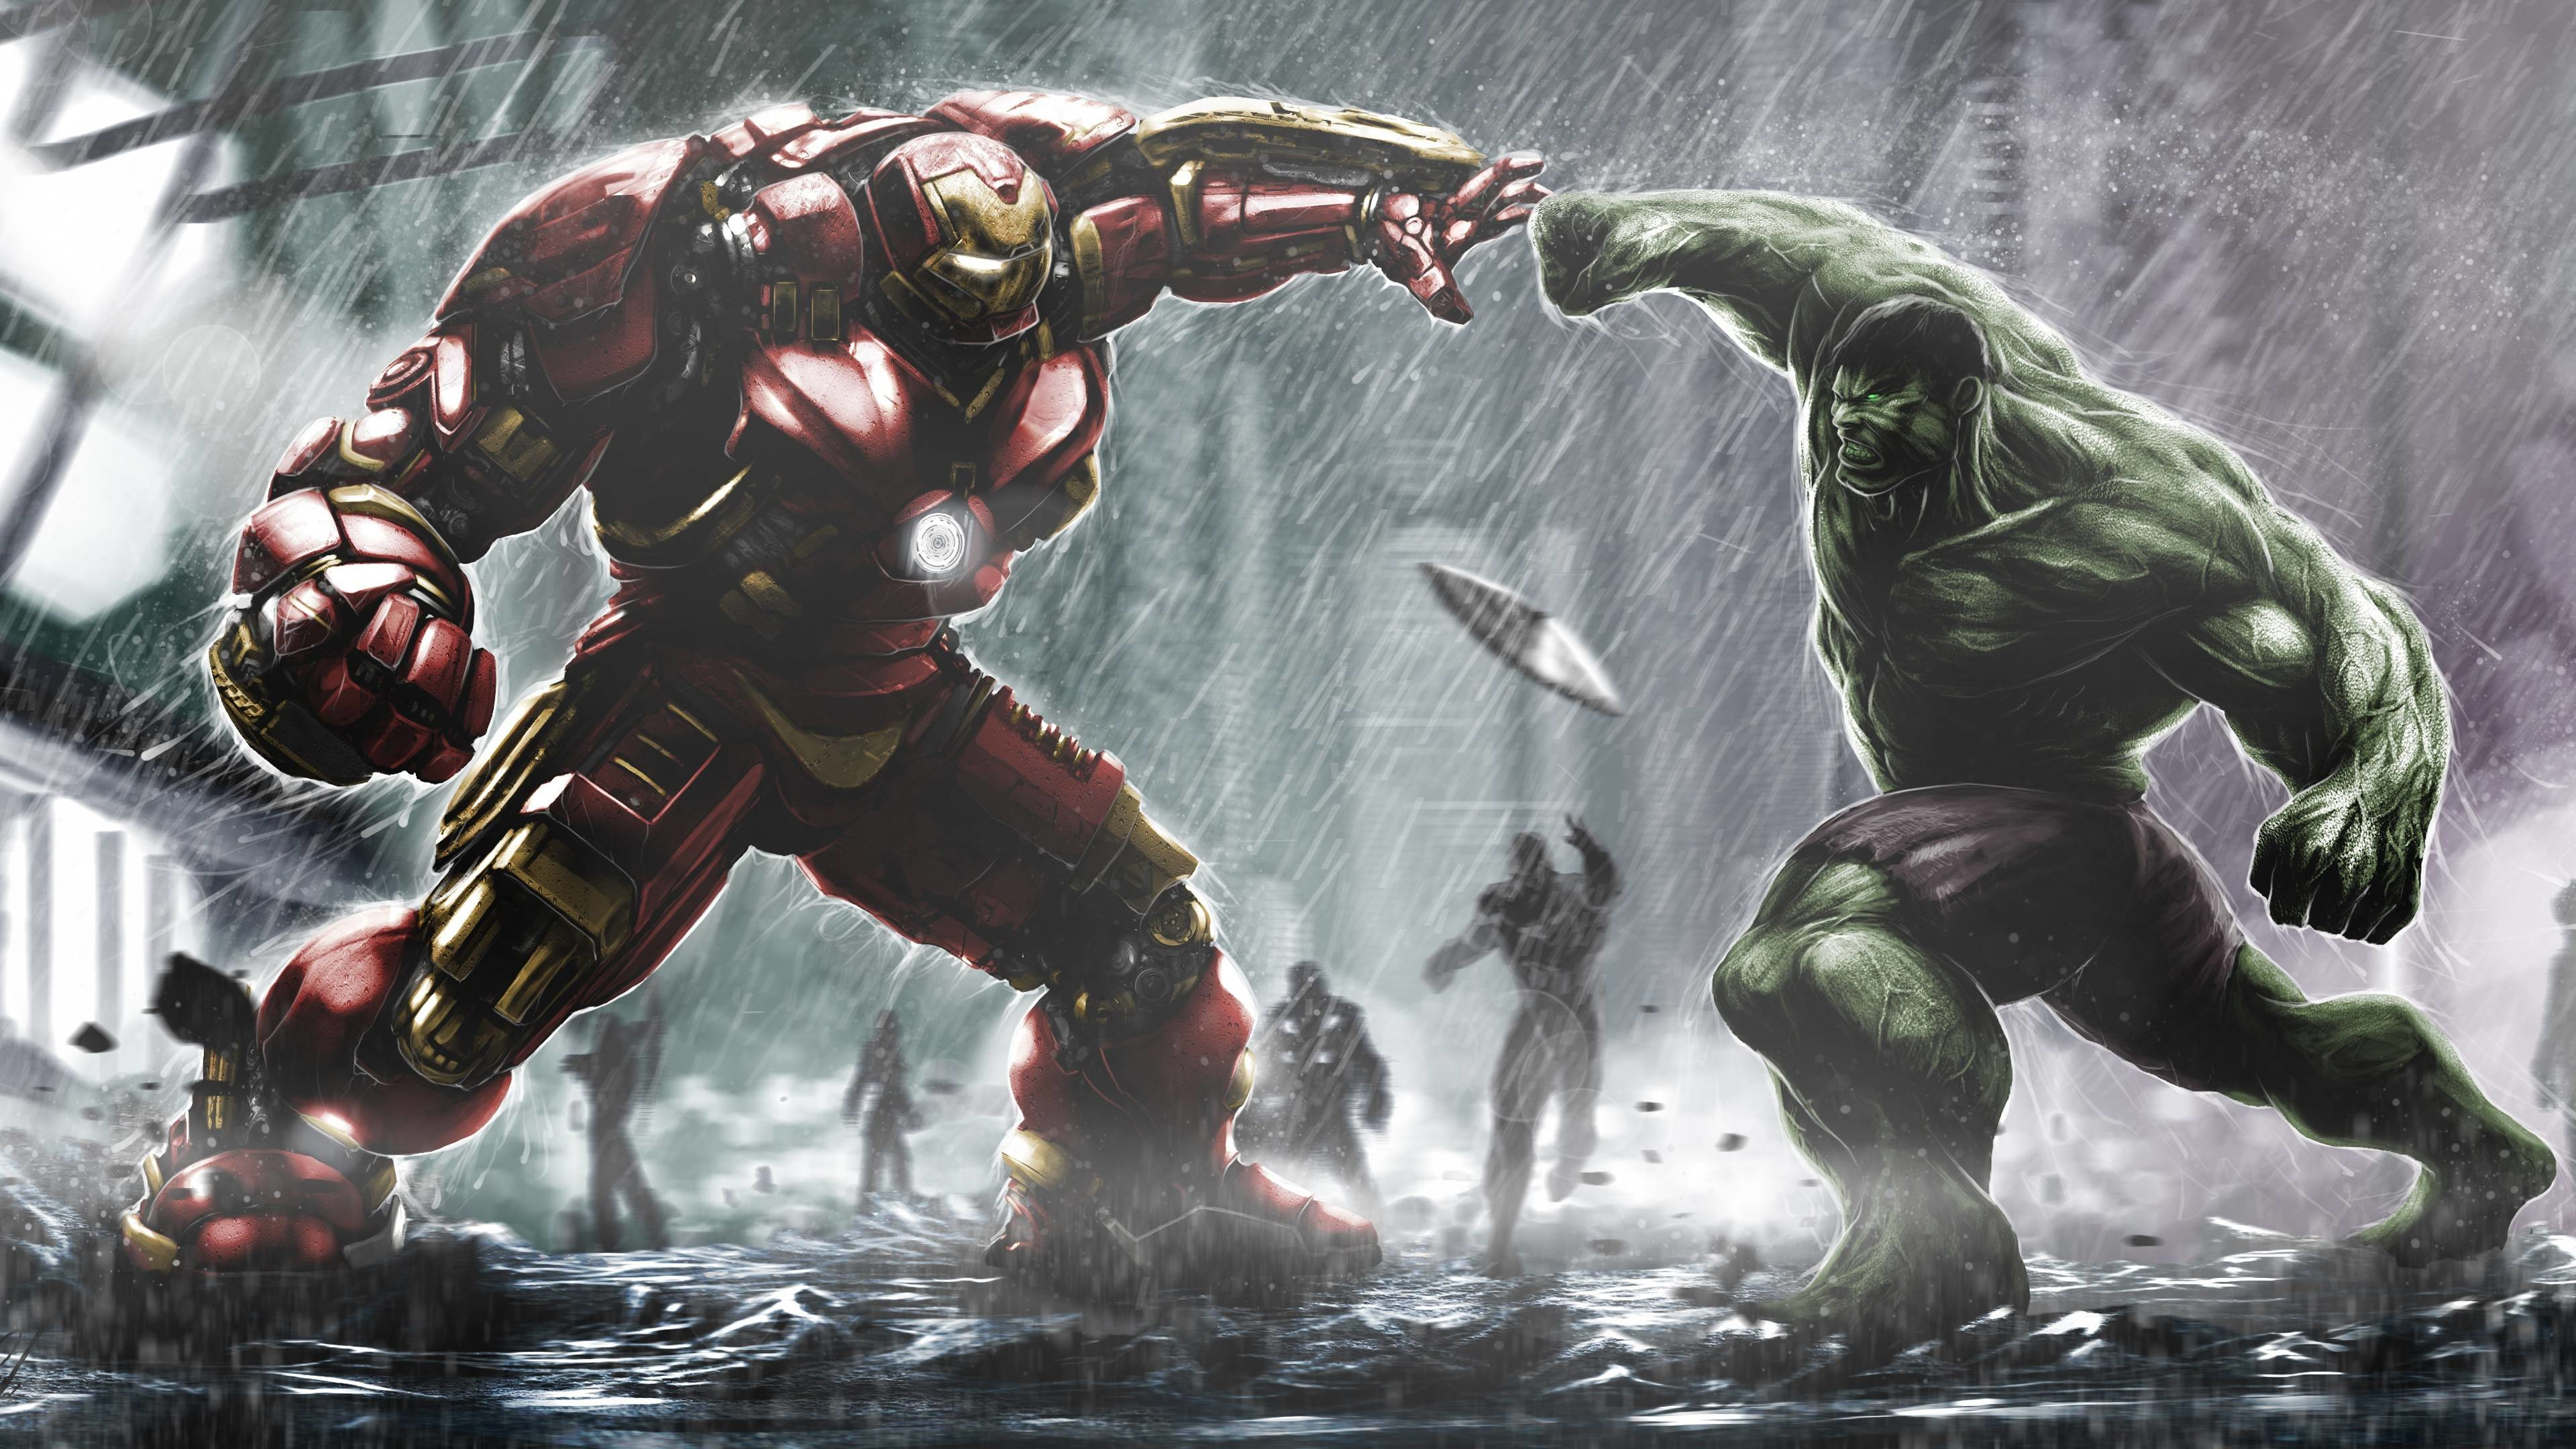 Hulkbuster Ironman Vs Hulk Wallpapers | HD Wallpapers